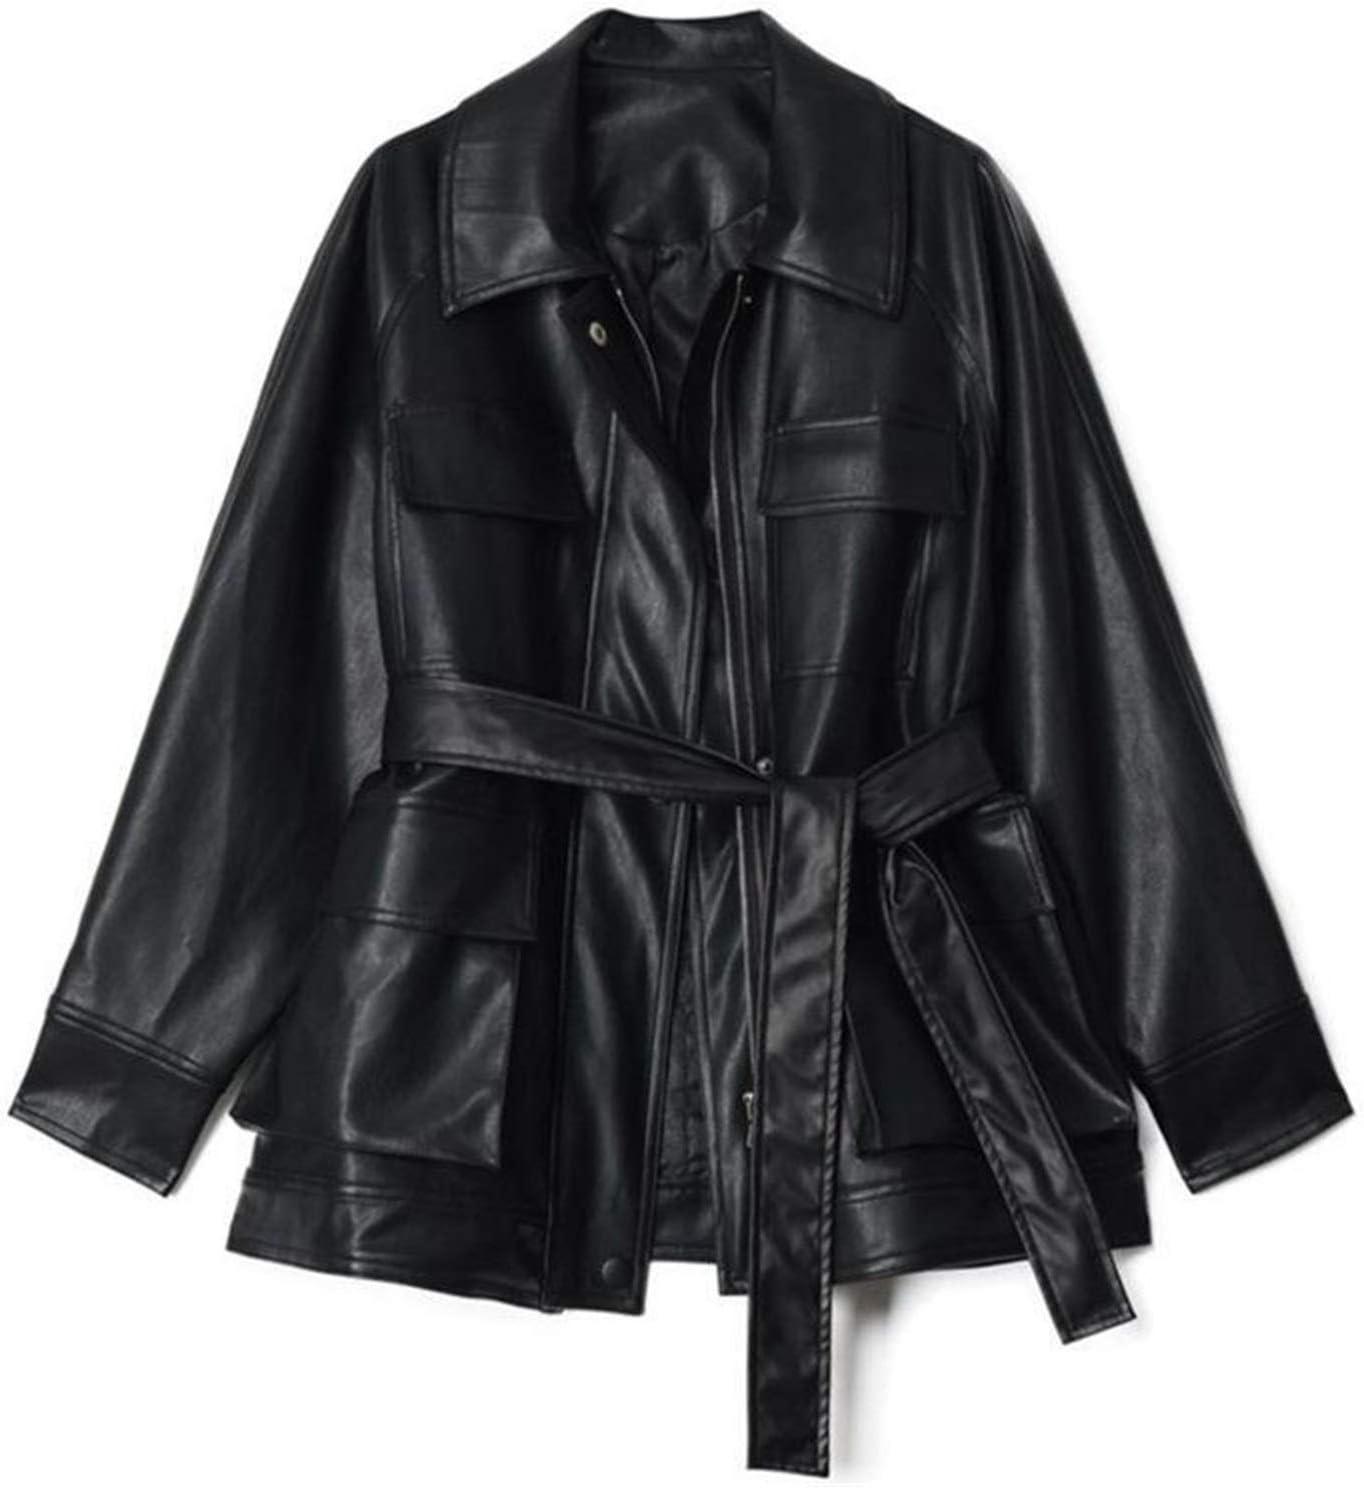 kengbi Jacket Spring Autumn Chic Four Big Pockets Oversized Design Vintage Retro Women Female Pu Leather Jacket (Color : Black, Size : M)